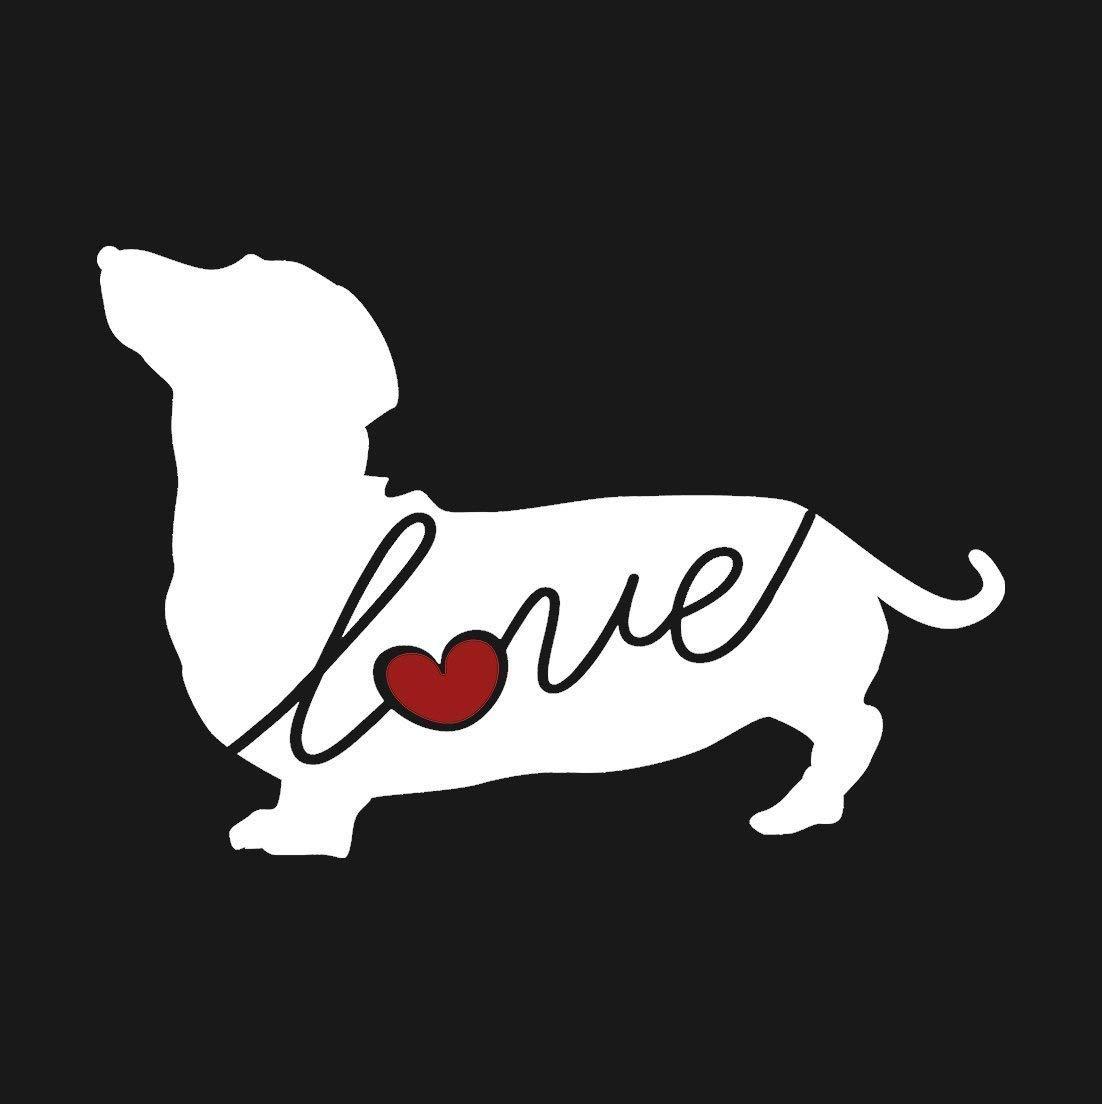 Dachshund (Wiener Dog) Love - Car Window Vinyl Decal Sticker (Script Font)